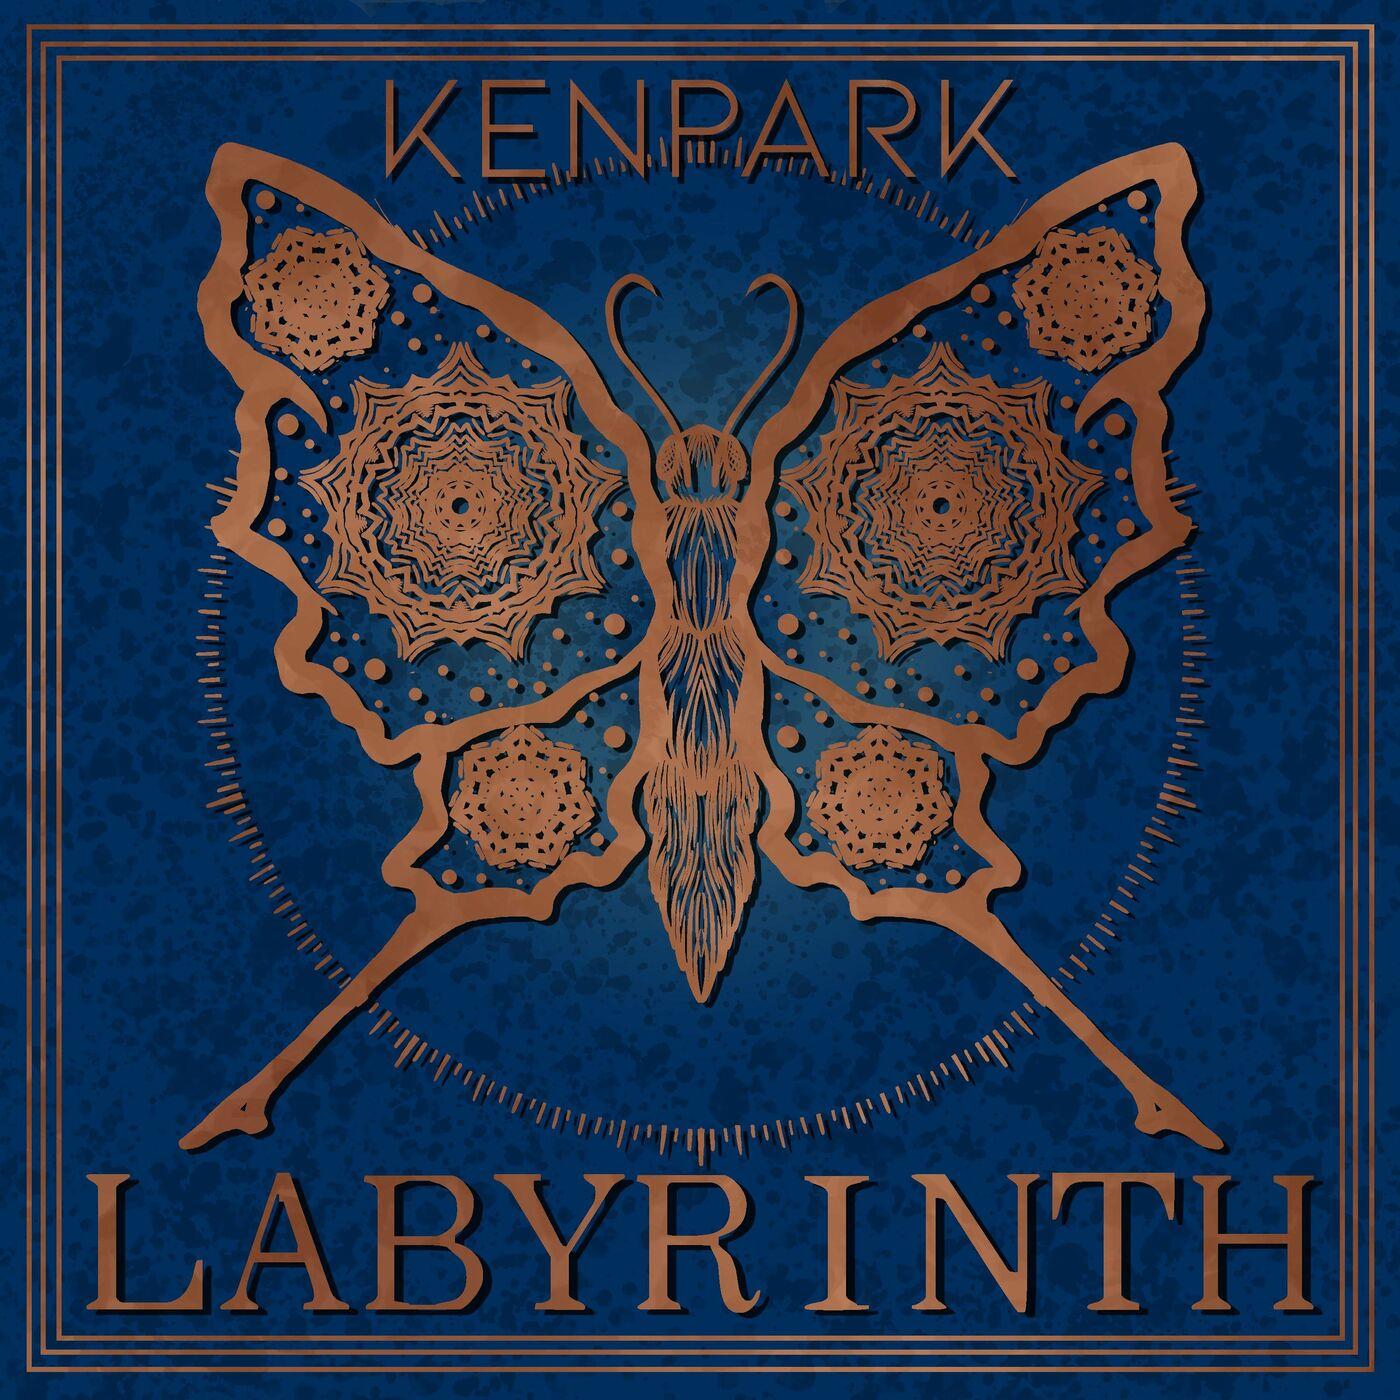 Kenpark - Labyrinth [single] (2020)